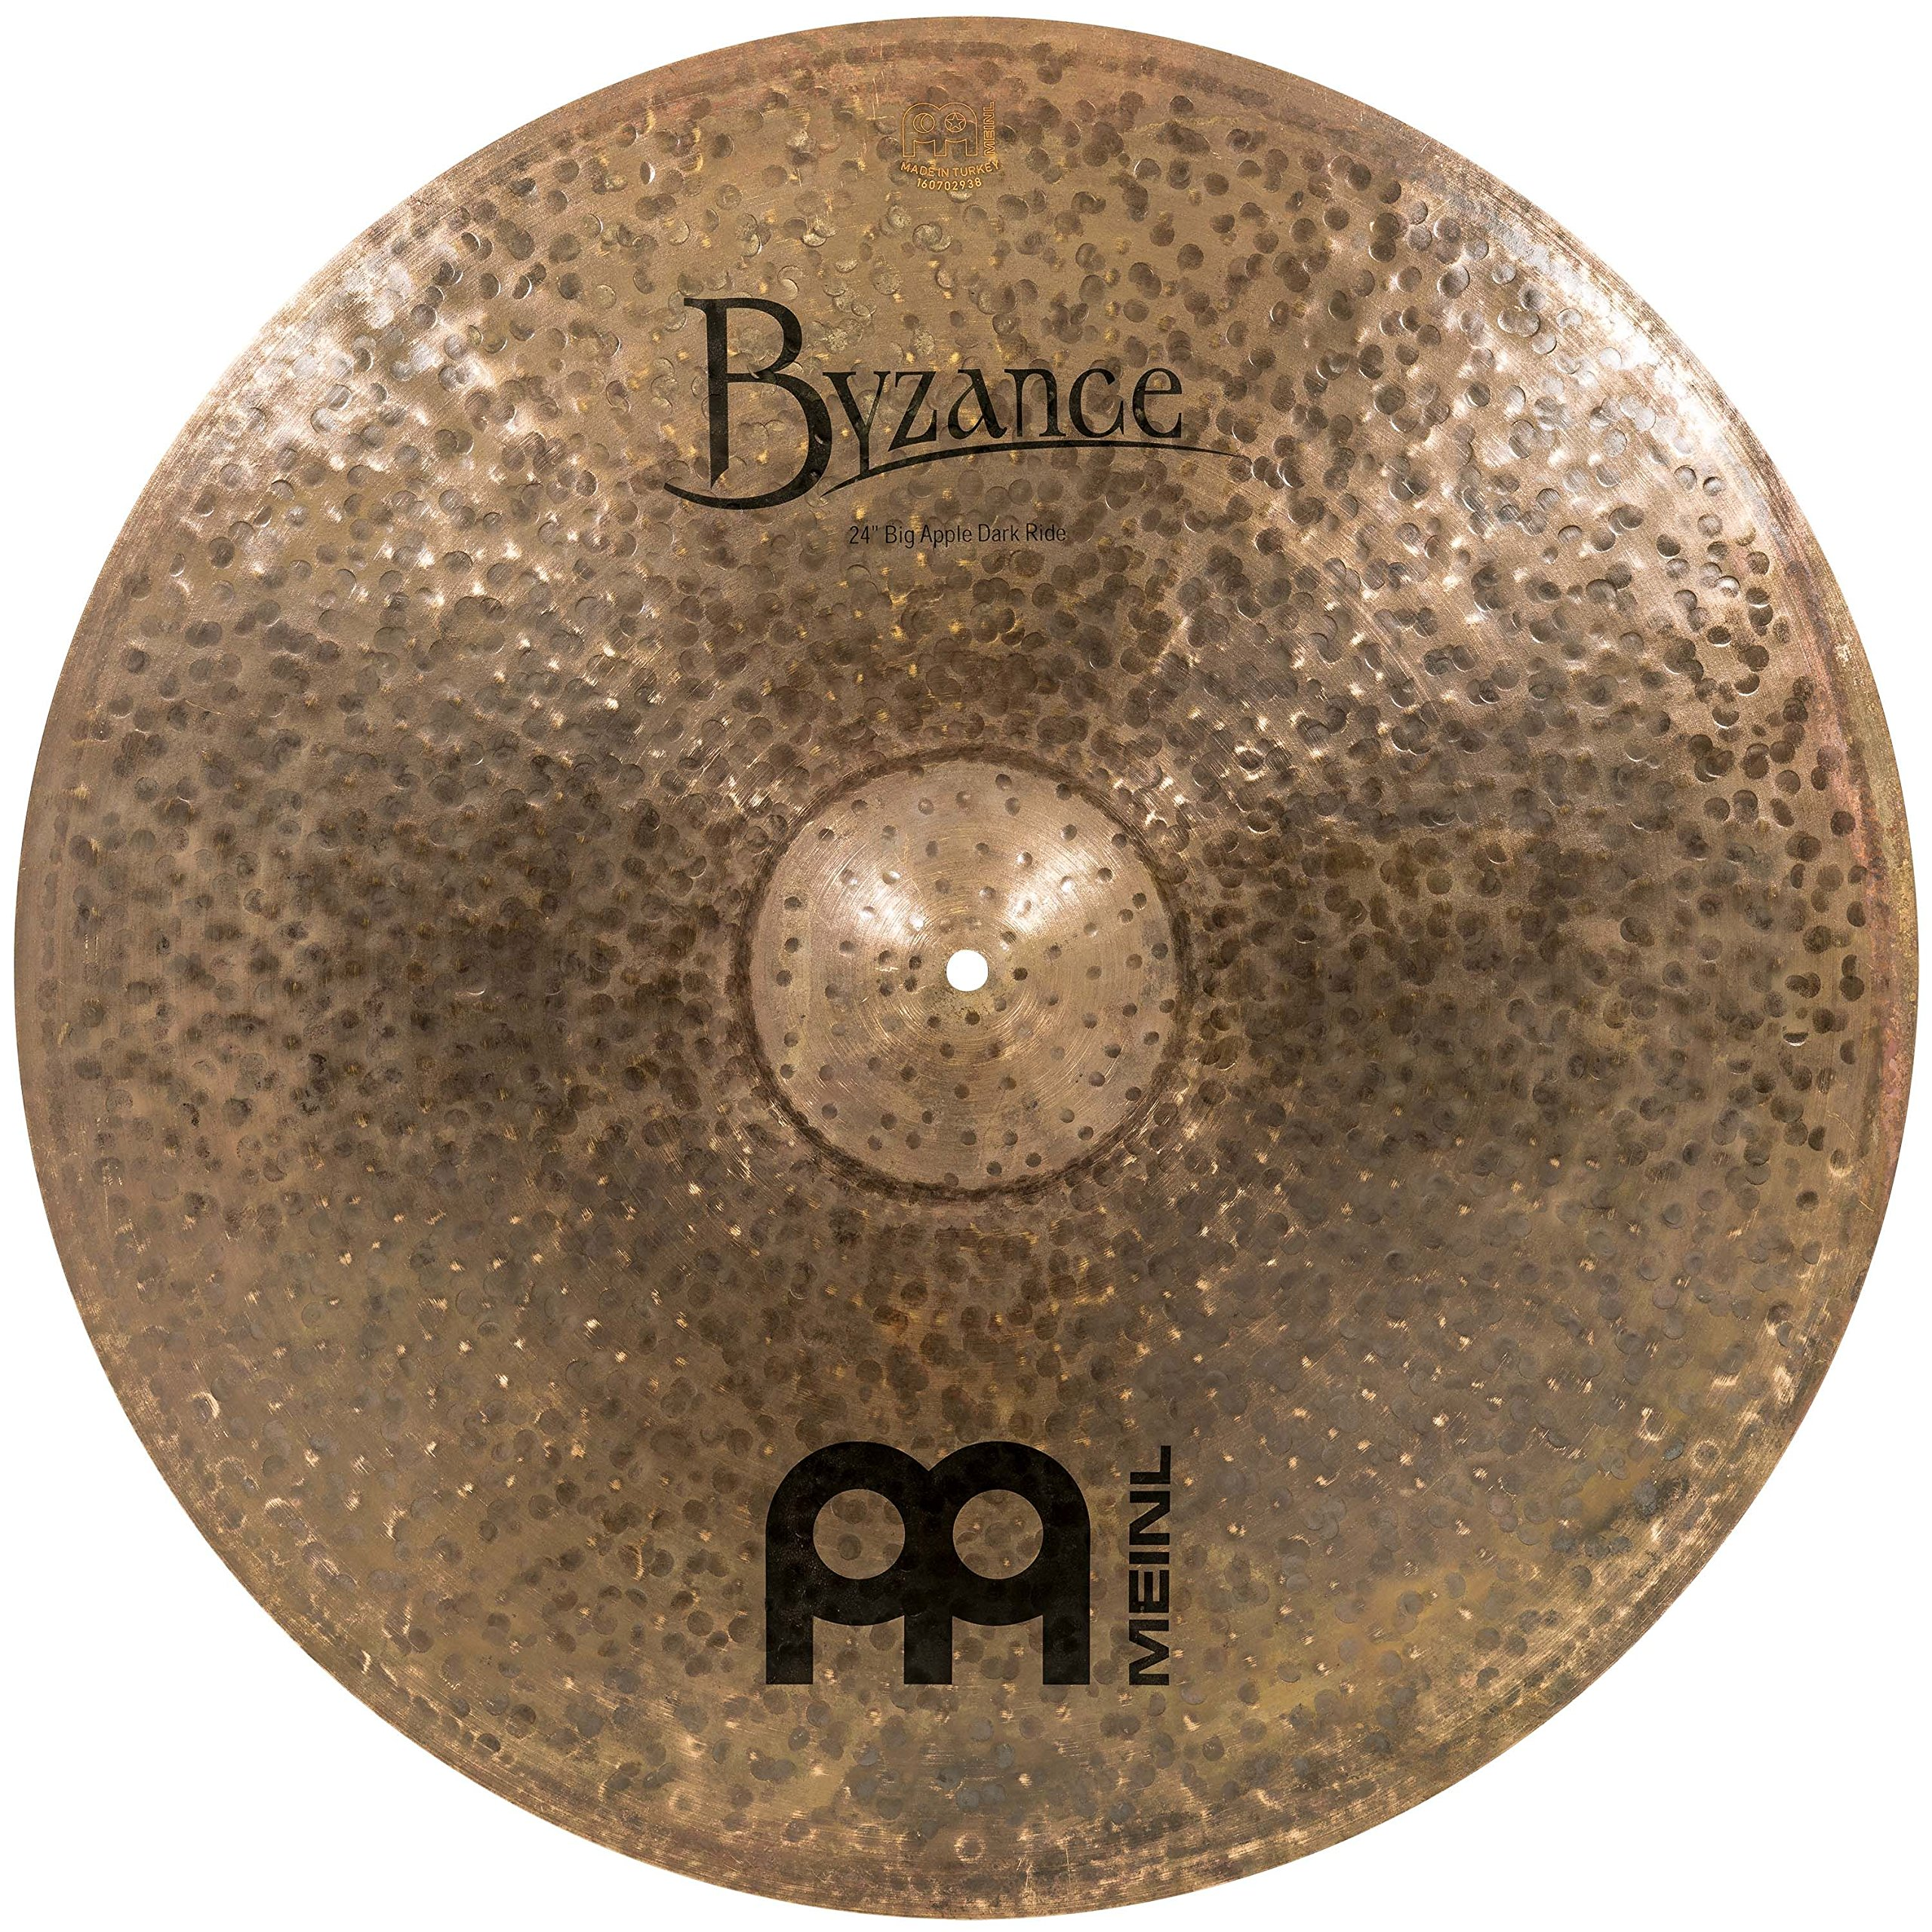 Meinl Cymbals B24BADAR Byzance Jazz 24-Inch Big Apple Dark Ride Cymbal (VIDEO)